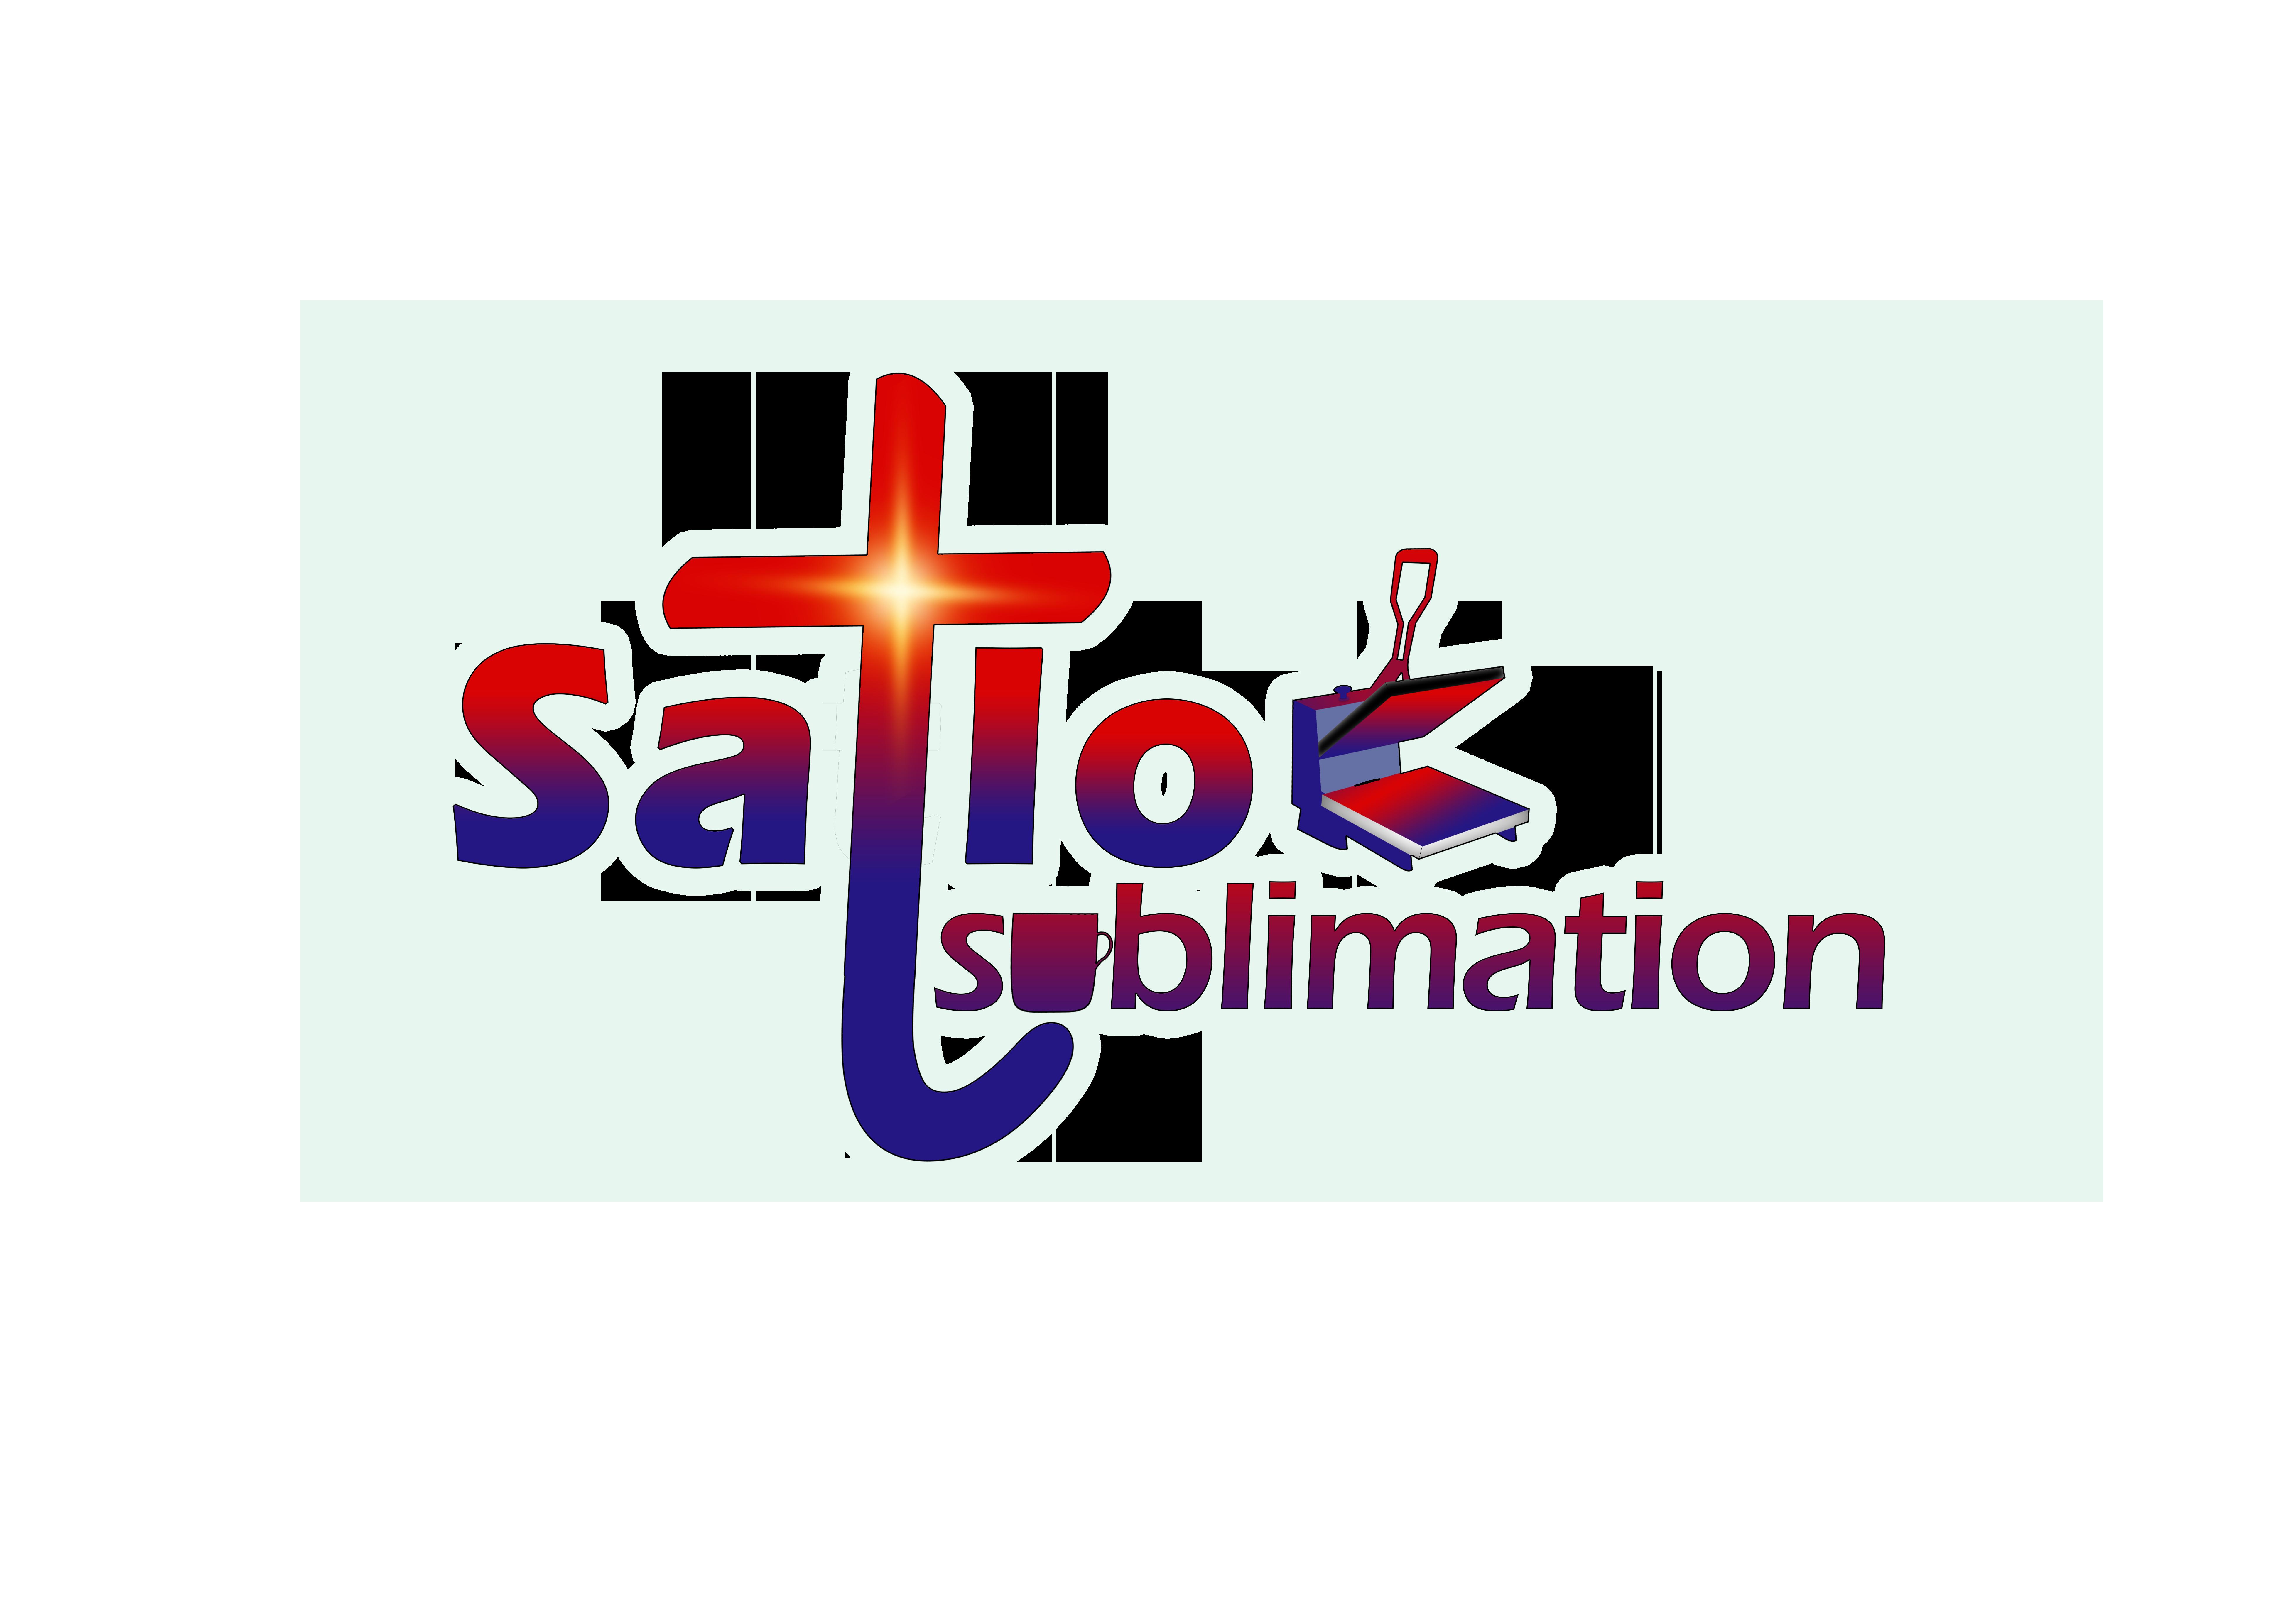 Satlok Sublimation Logo